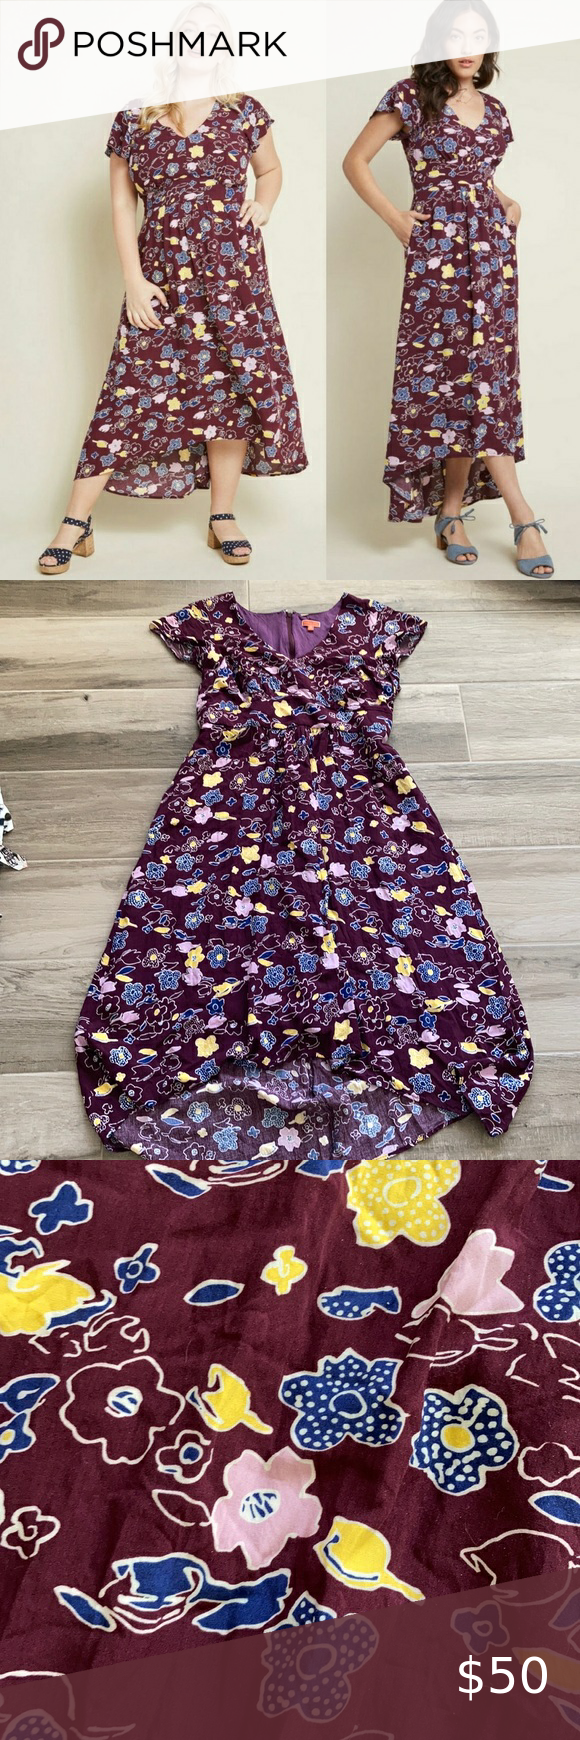 Modcloth 2x Gallery Flattery Maxi Dress Retro Print Dresses Mod Cloth Dresses Red Dress Maxi [ 1740 x 580 Pixel ]